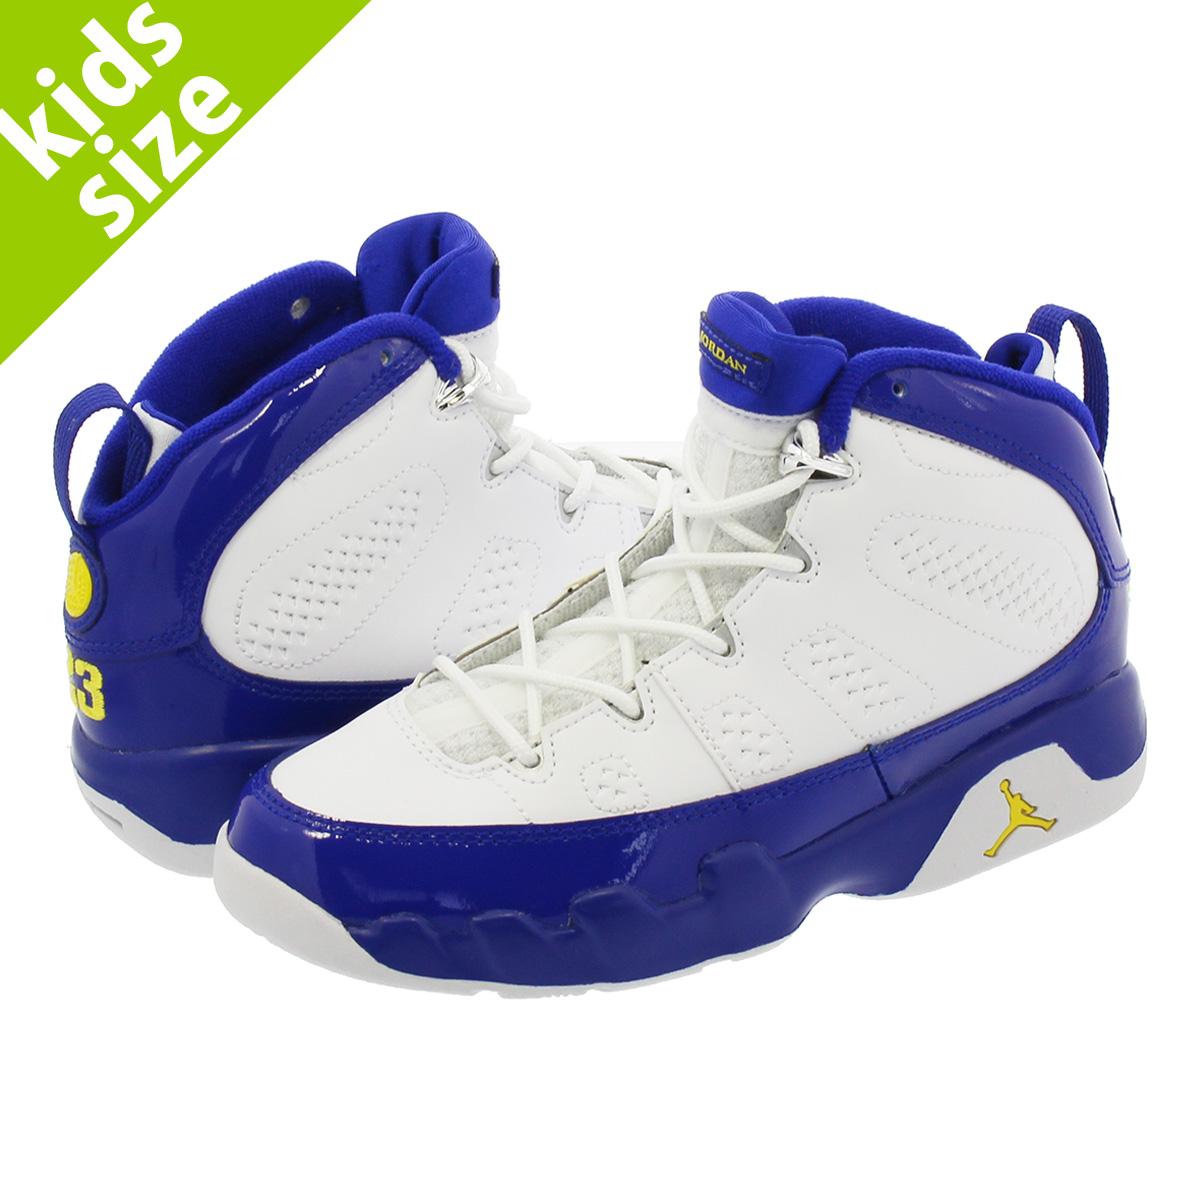 quality design 1184f e148e NIKE AIR JORDAN 9 RETRO PS Nike Air Jordan 9 nostalgic PS WHITE CONCORD TOUR  YELLOW